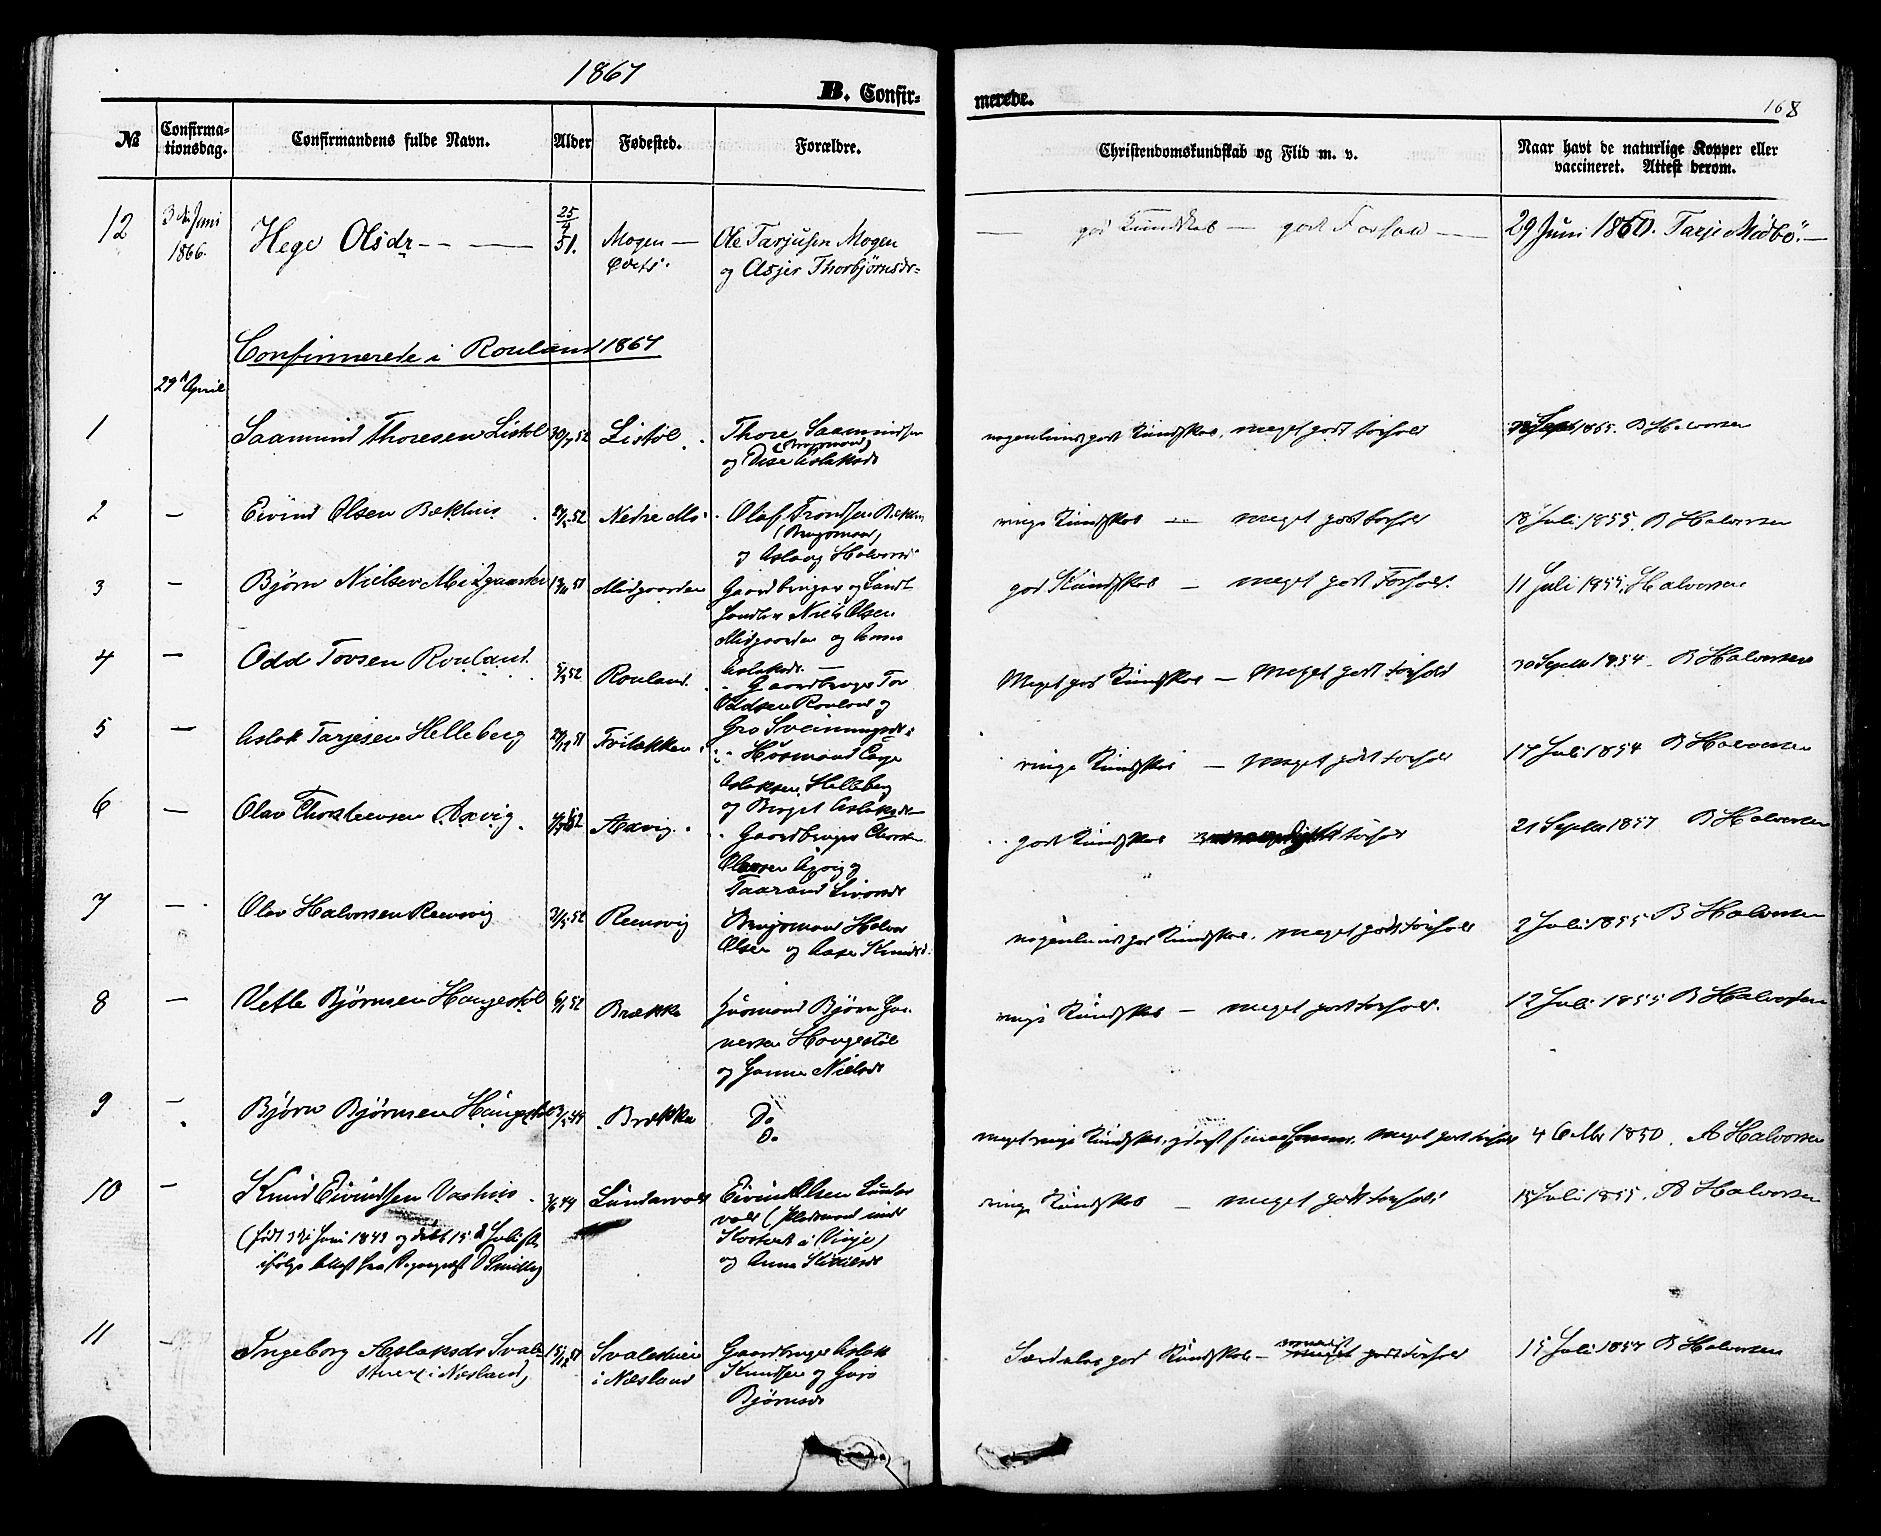 SAKO, Rauland kirkebøker, F/Fa/L0003: Ministerialbok nr. 3, 1859-1886, s. 168